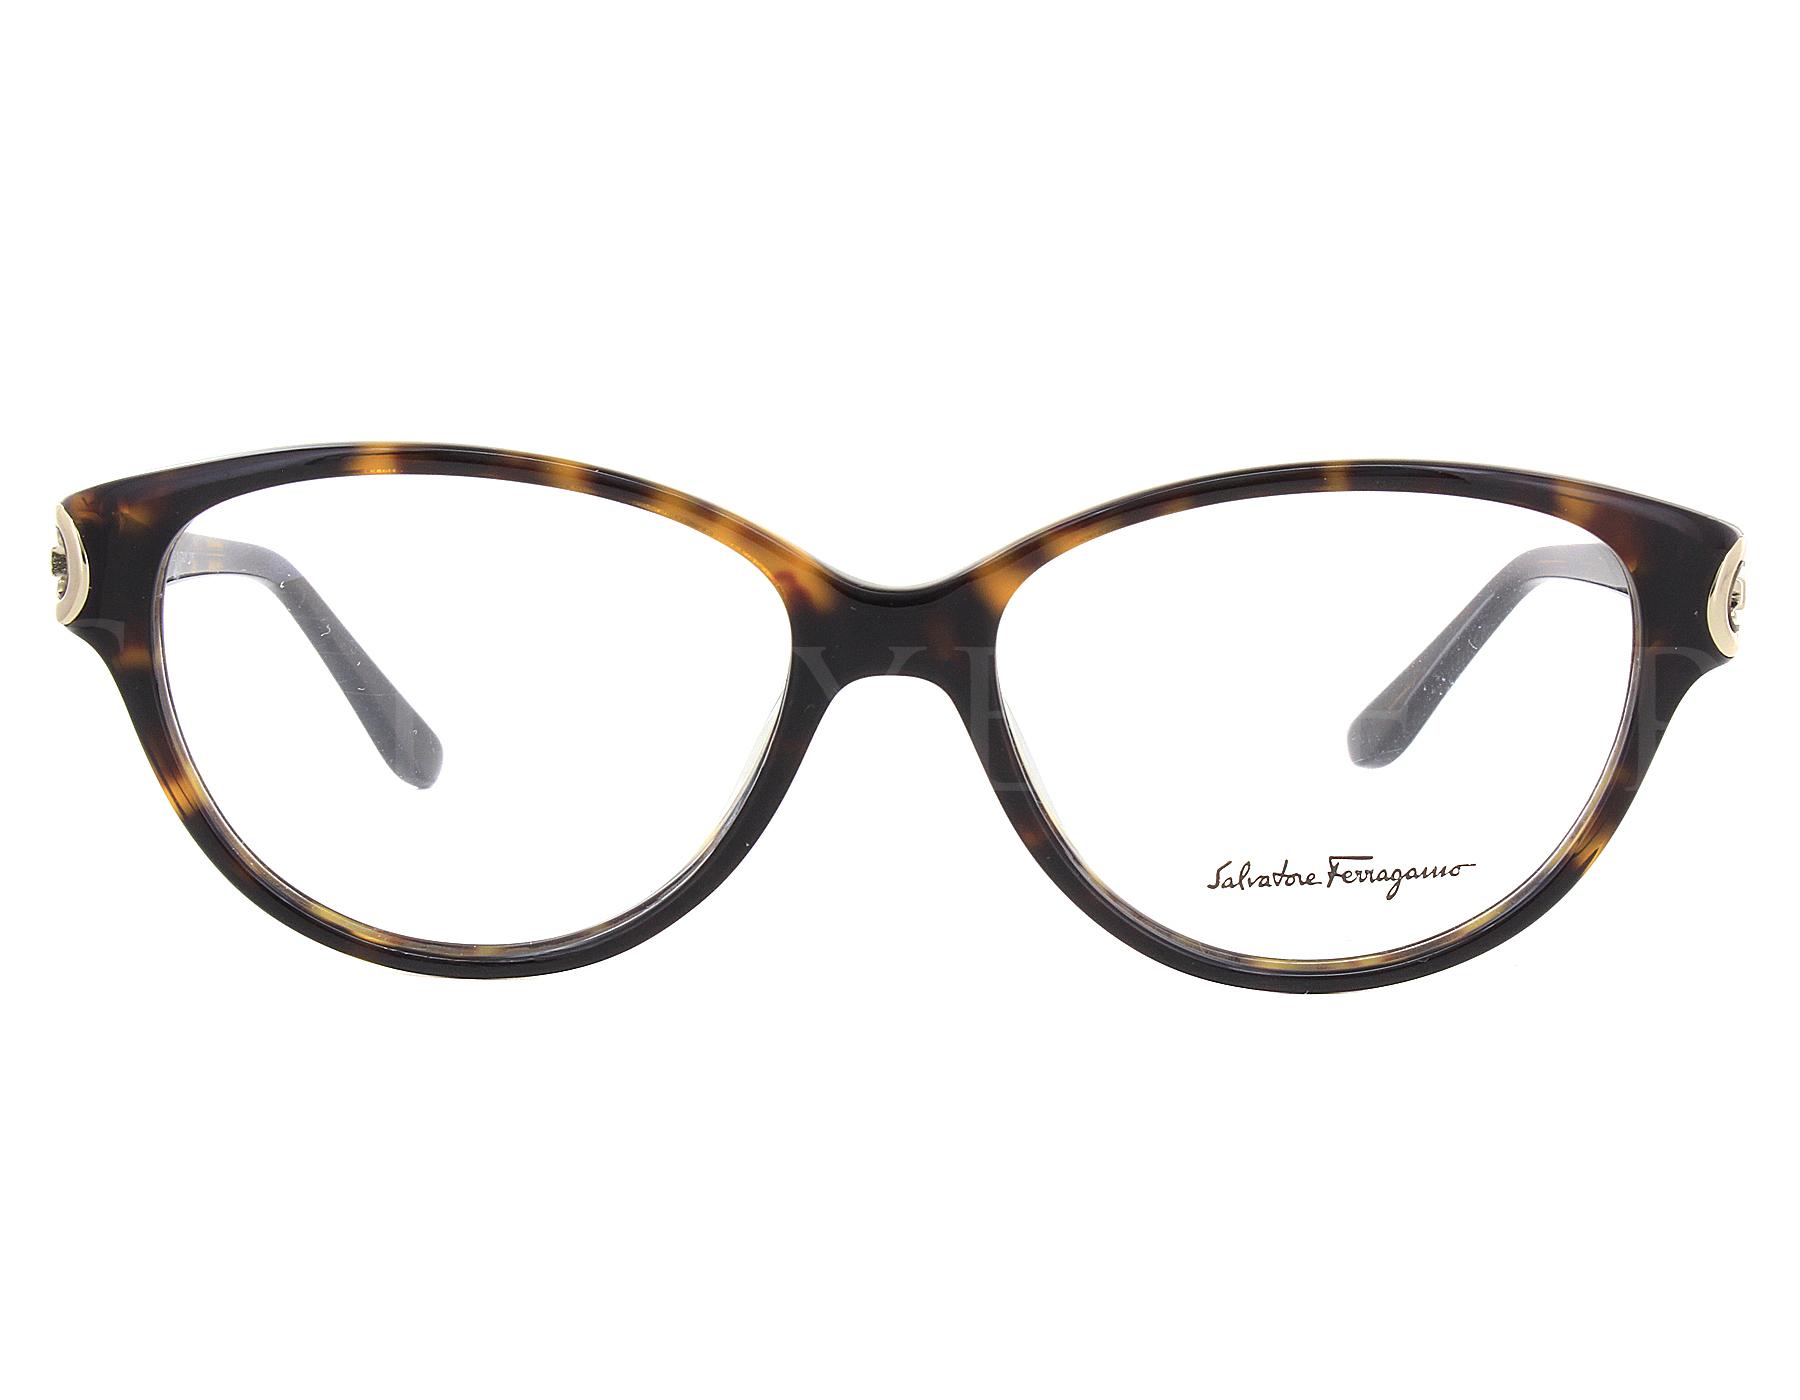 5f0e2f9afe NEW Salvatore Ferragamo SF 2735 214 53mm Tortoise Optical Eyeglasses ...